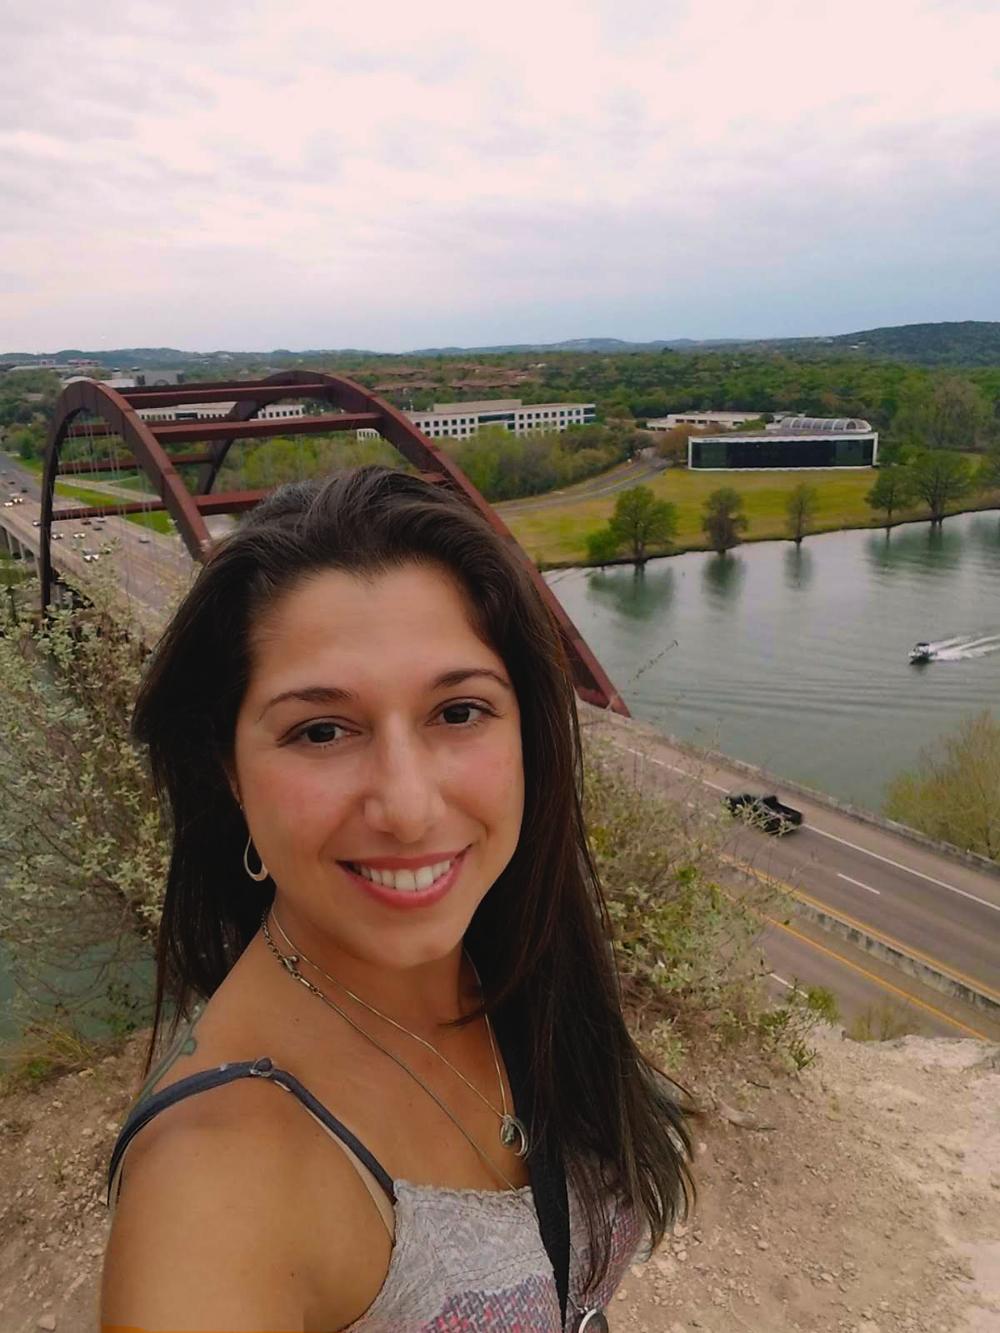 Pennybacker bridge, Penny backer , bridge in Austin, Austin texas, tourism in austin